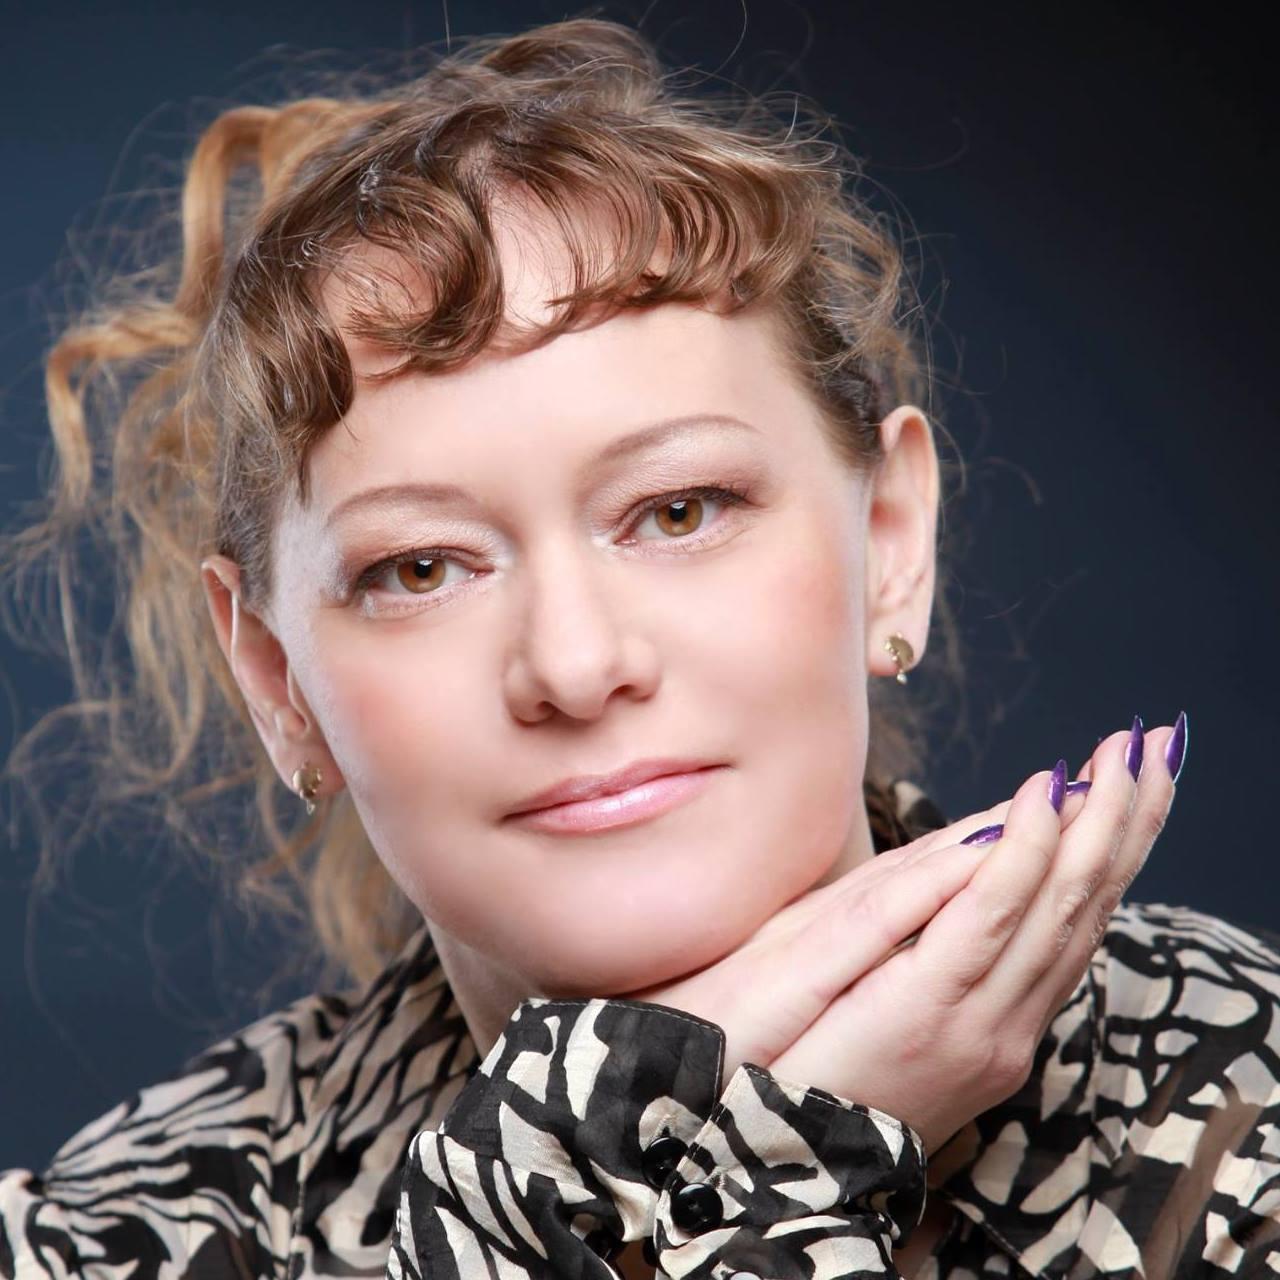 Liudmila Druzhinina